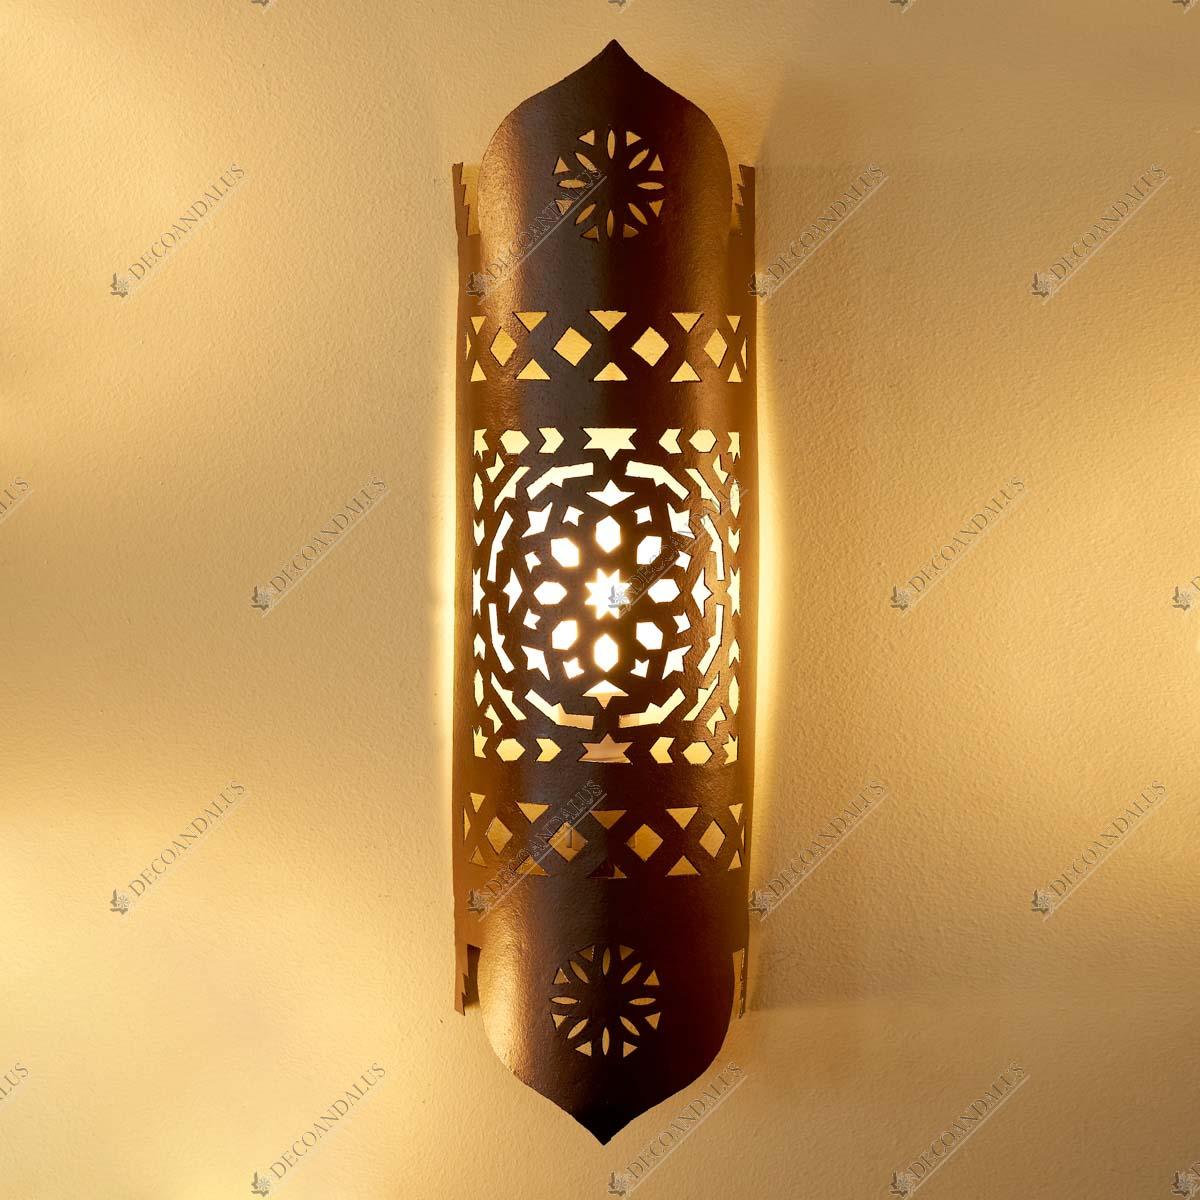 Aplique de pared iluminaci n decoandalus - Apliques arabes ...